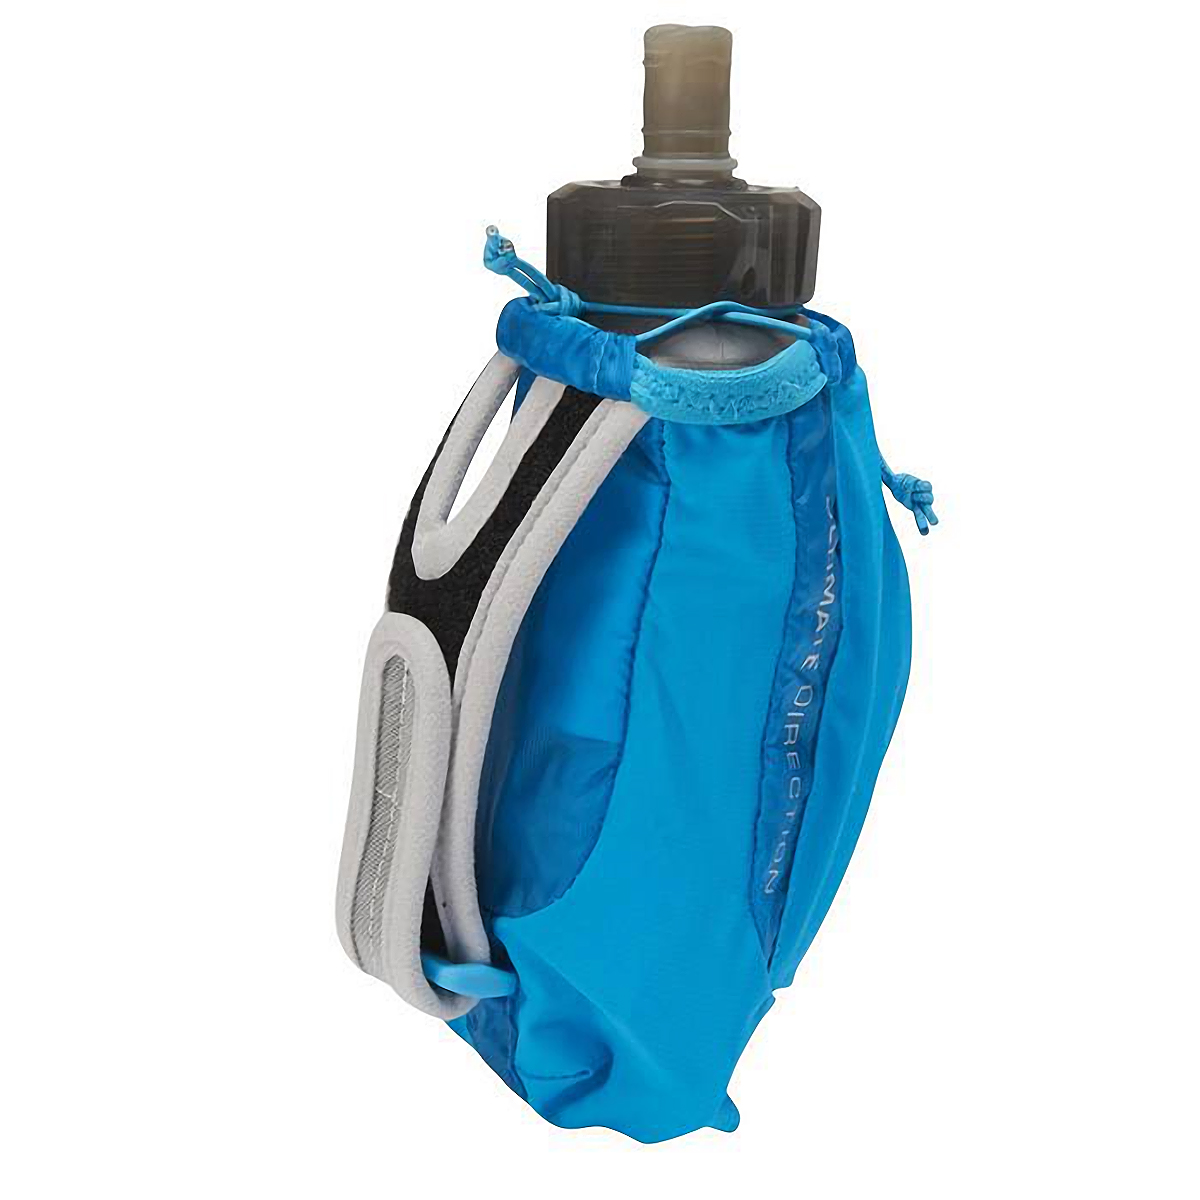 Ultimate Direct Clutch 5.0 Water Bottle - Color: Signature Blue, Signature Blue, large, image 2